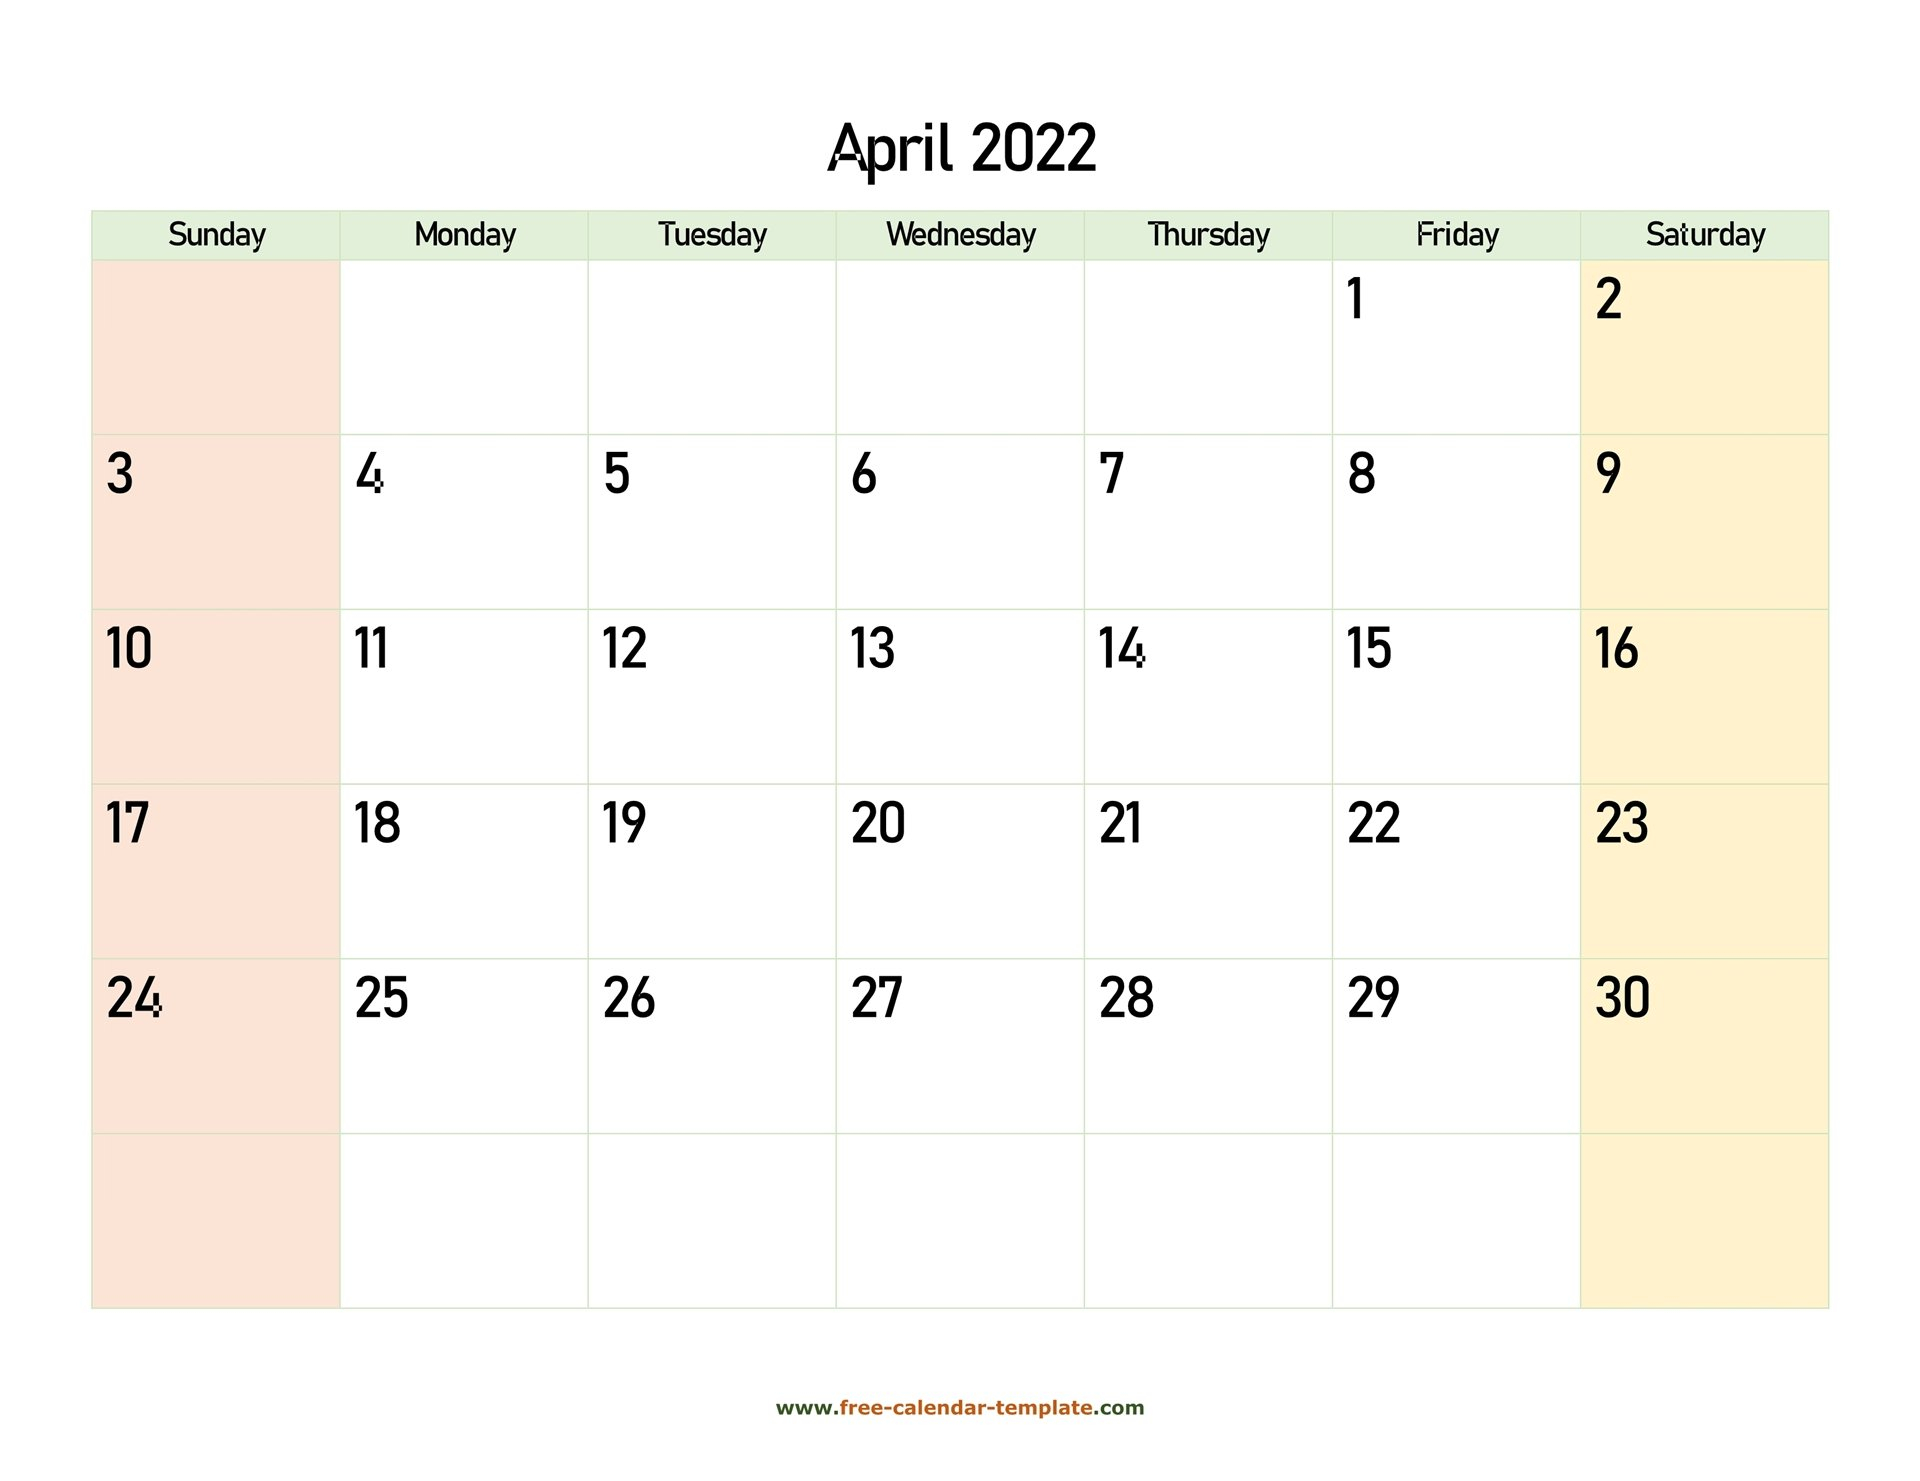 April 2022 Free Calendar Tempplate   Free-Calendar inside Printable Calendar April 2022 Free Photo